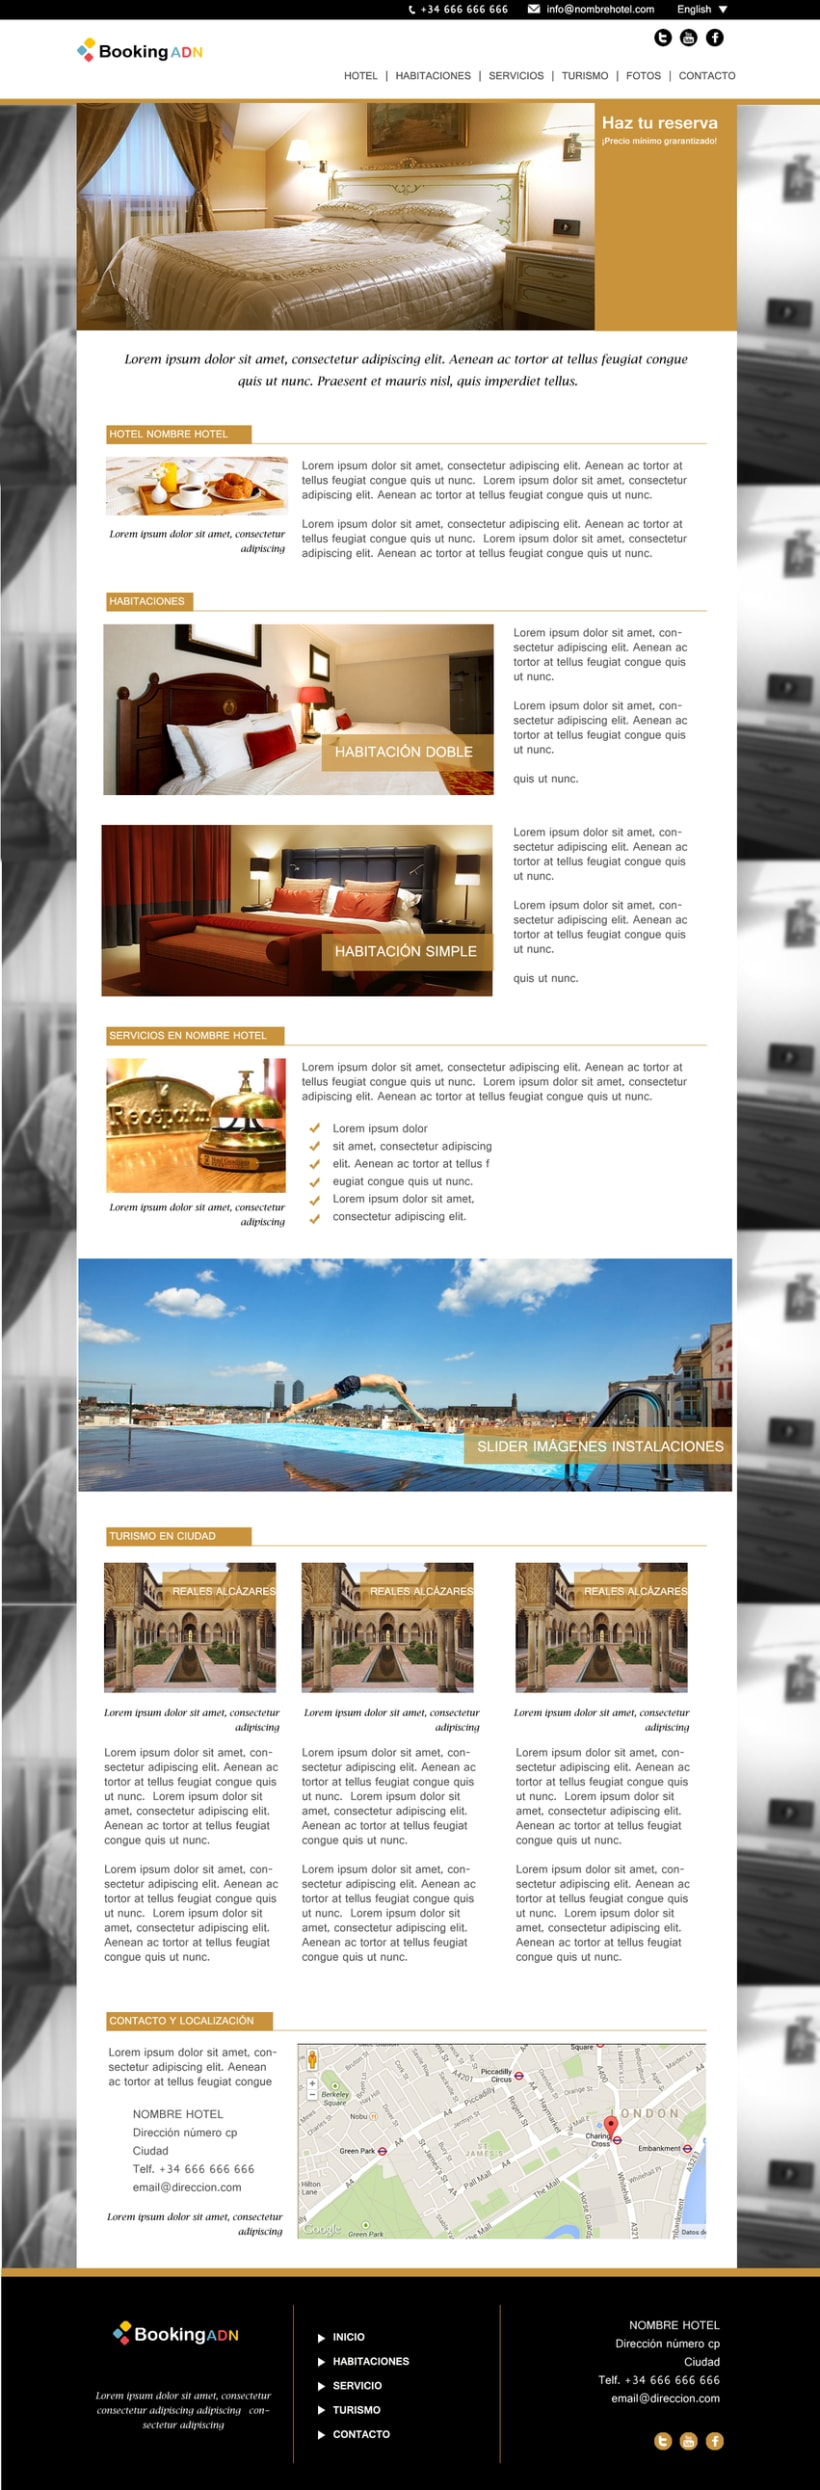 Diseño de interfaz - BookingADN 1